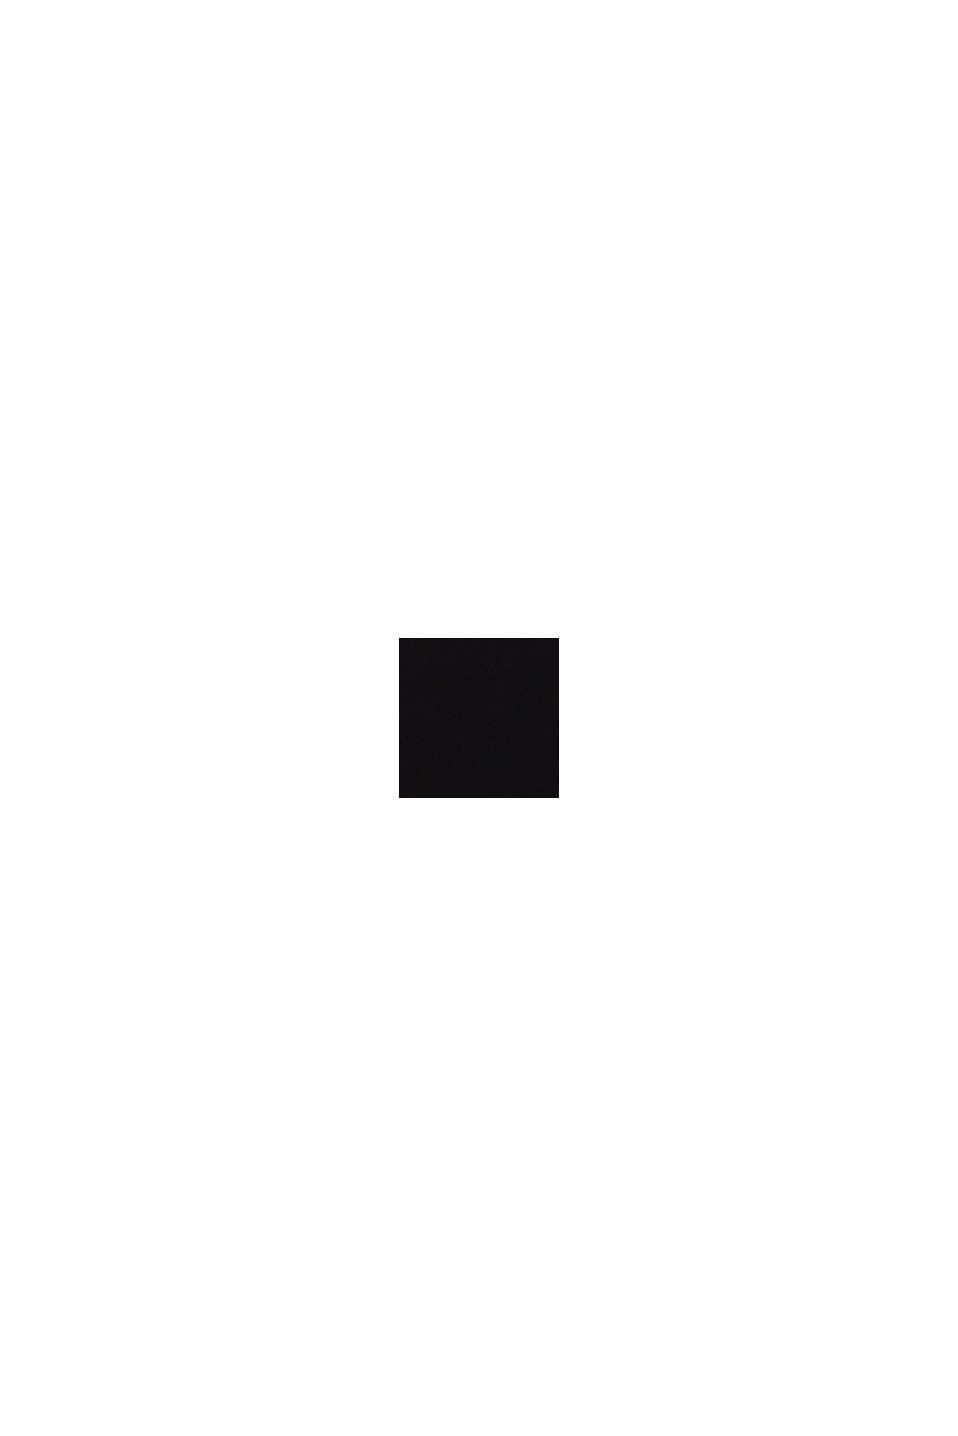 Crêpe top met kant, LENZING™ ECOVERO™, BLACK, swatch